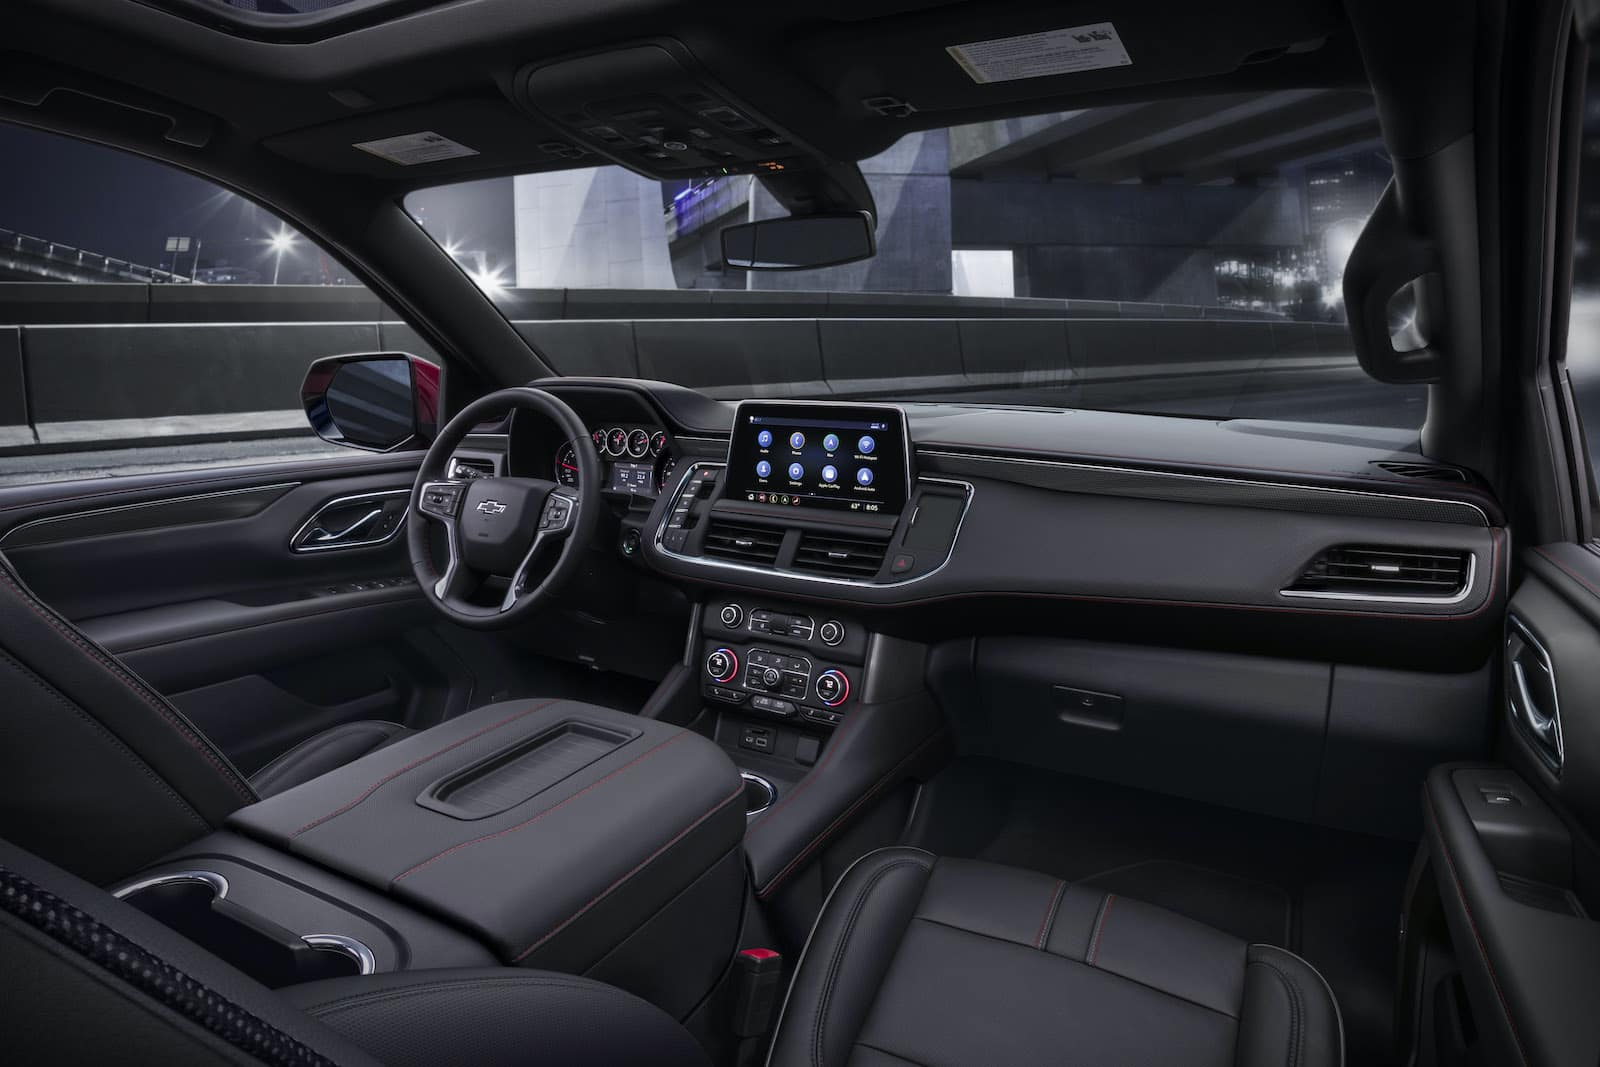 2021 Chevrolet Tahoe Trim Levels